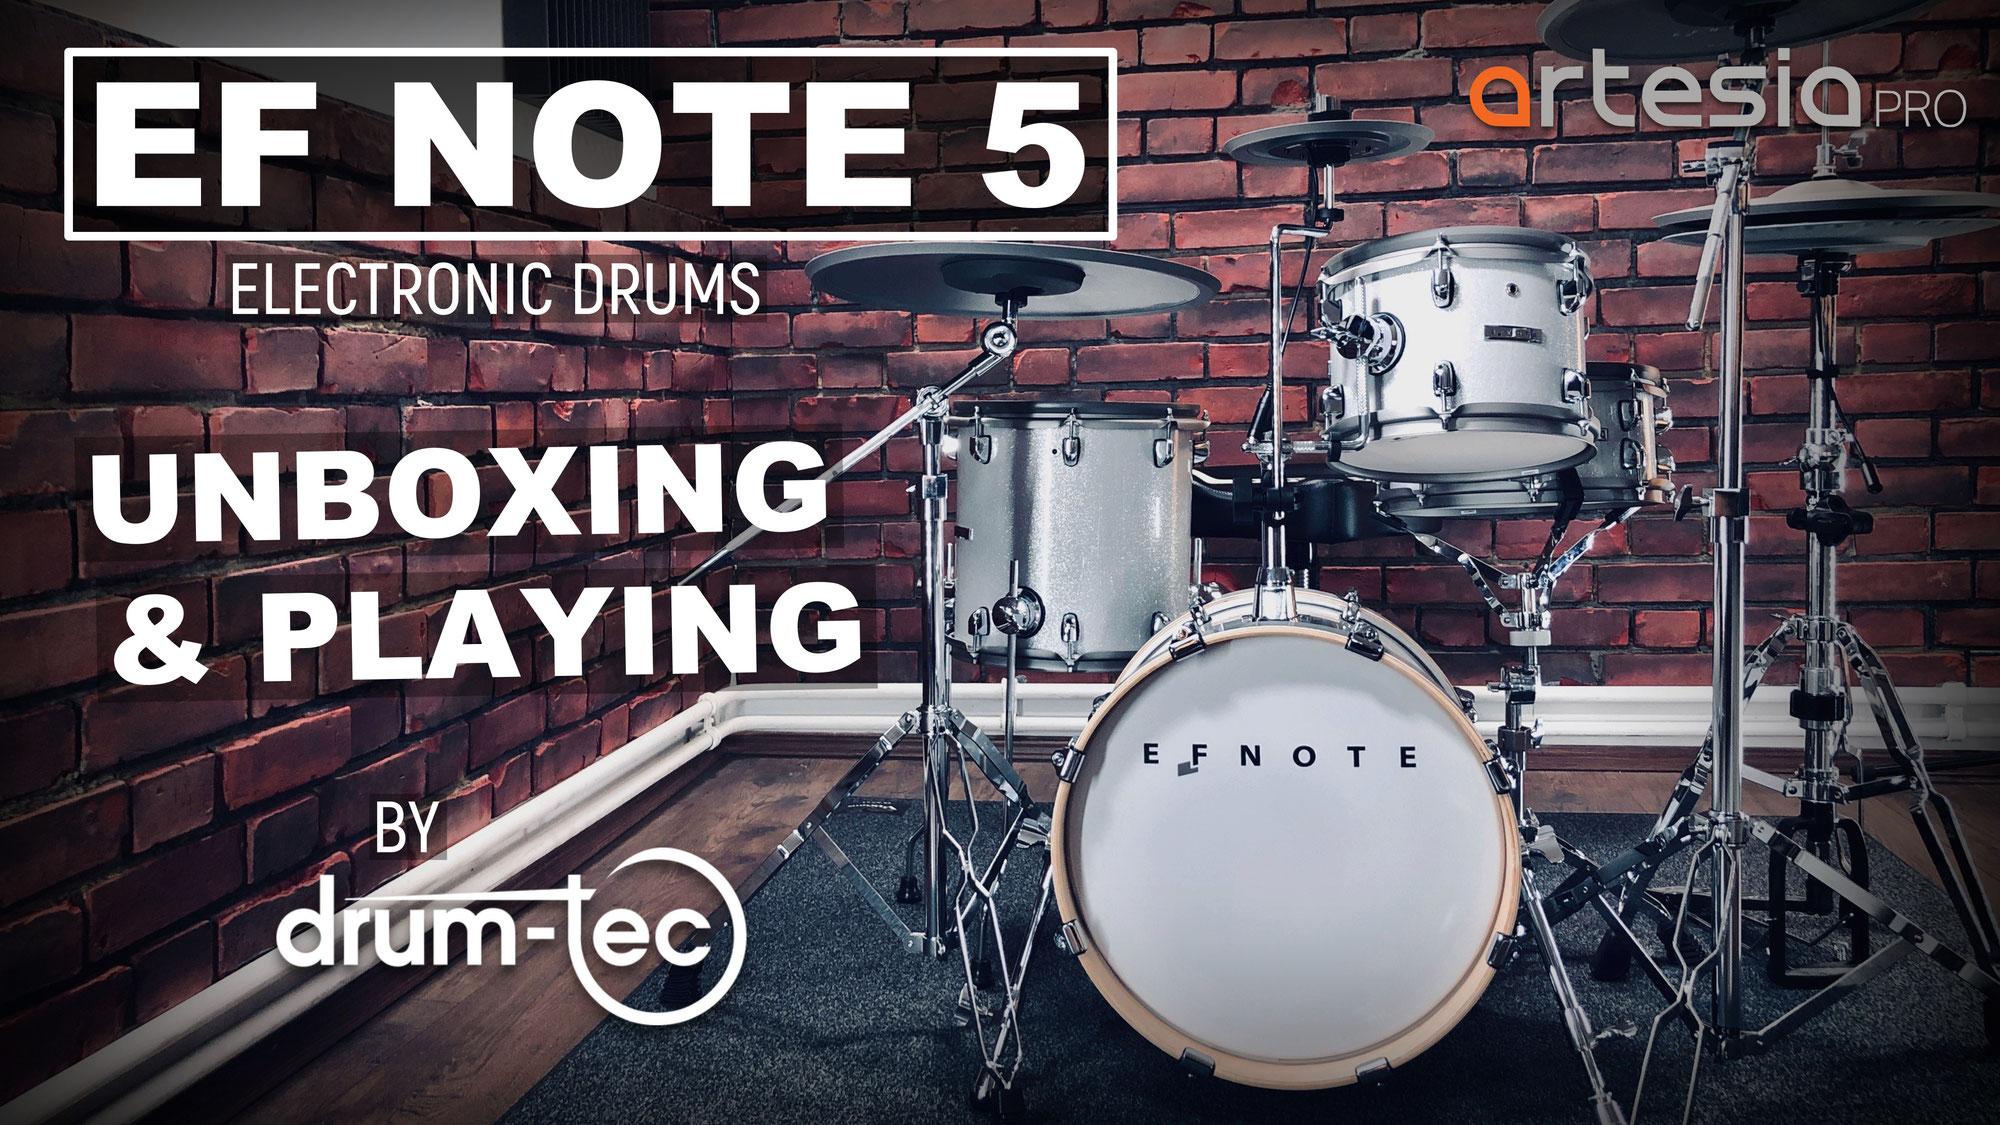 EFNOTE 5 electronic drums video demos